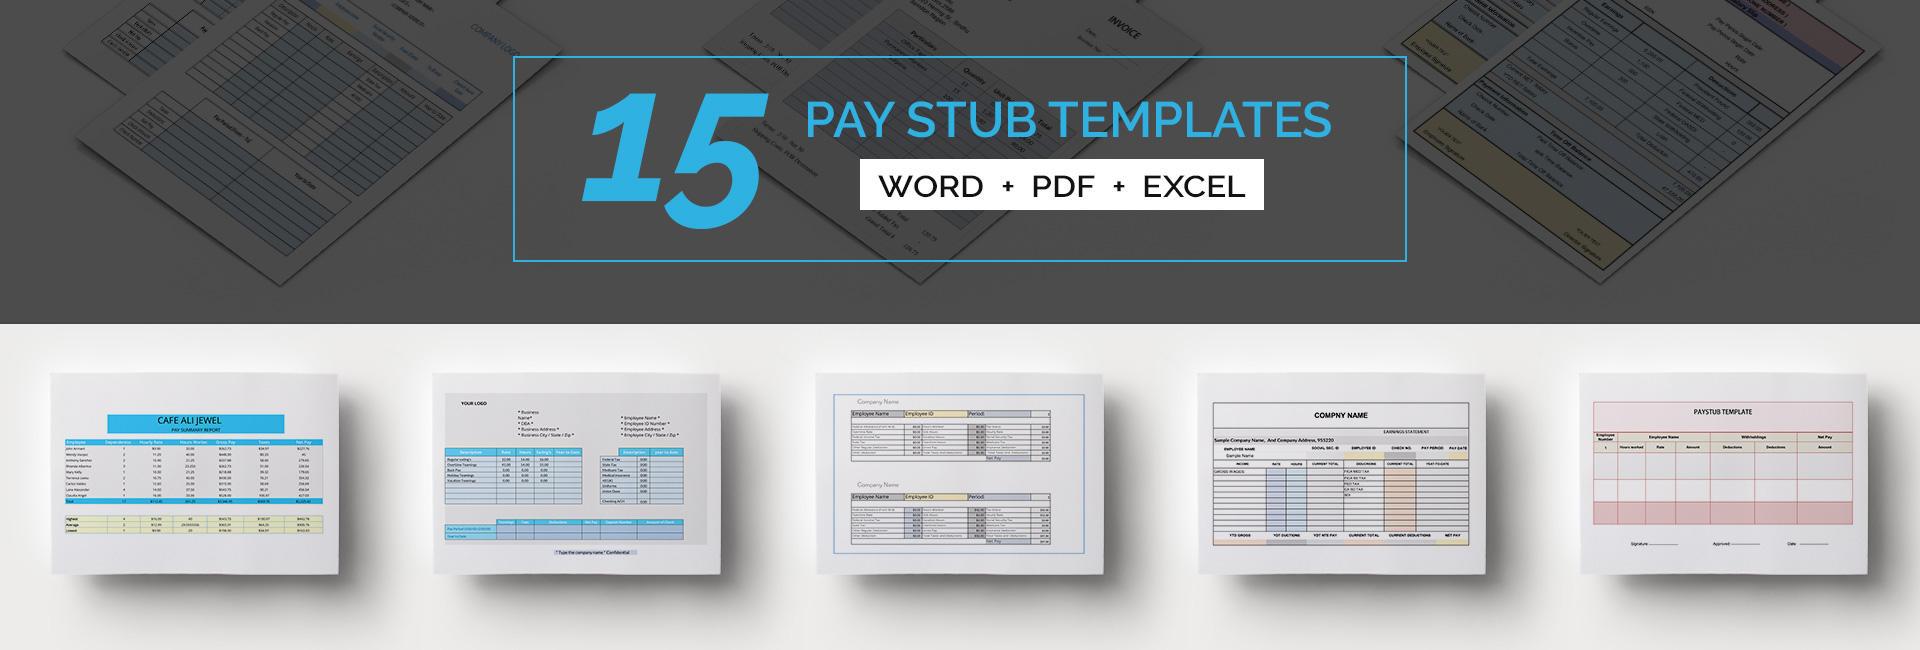 15pay_stub_template_bundle